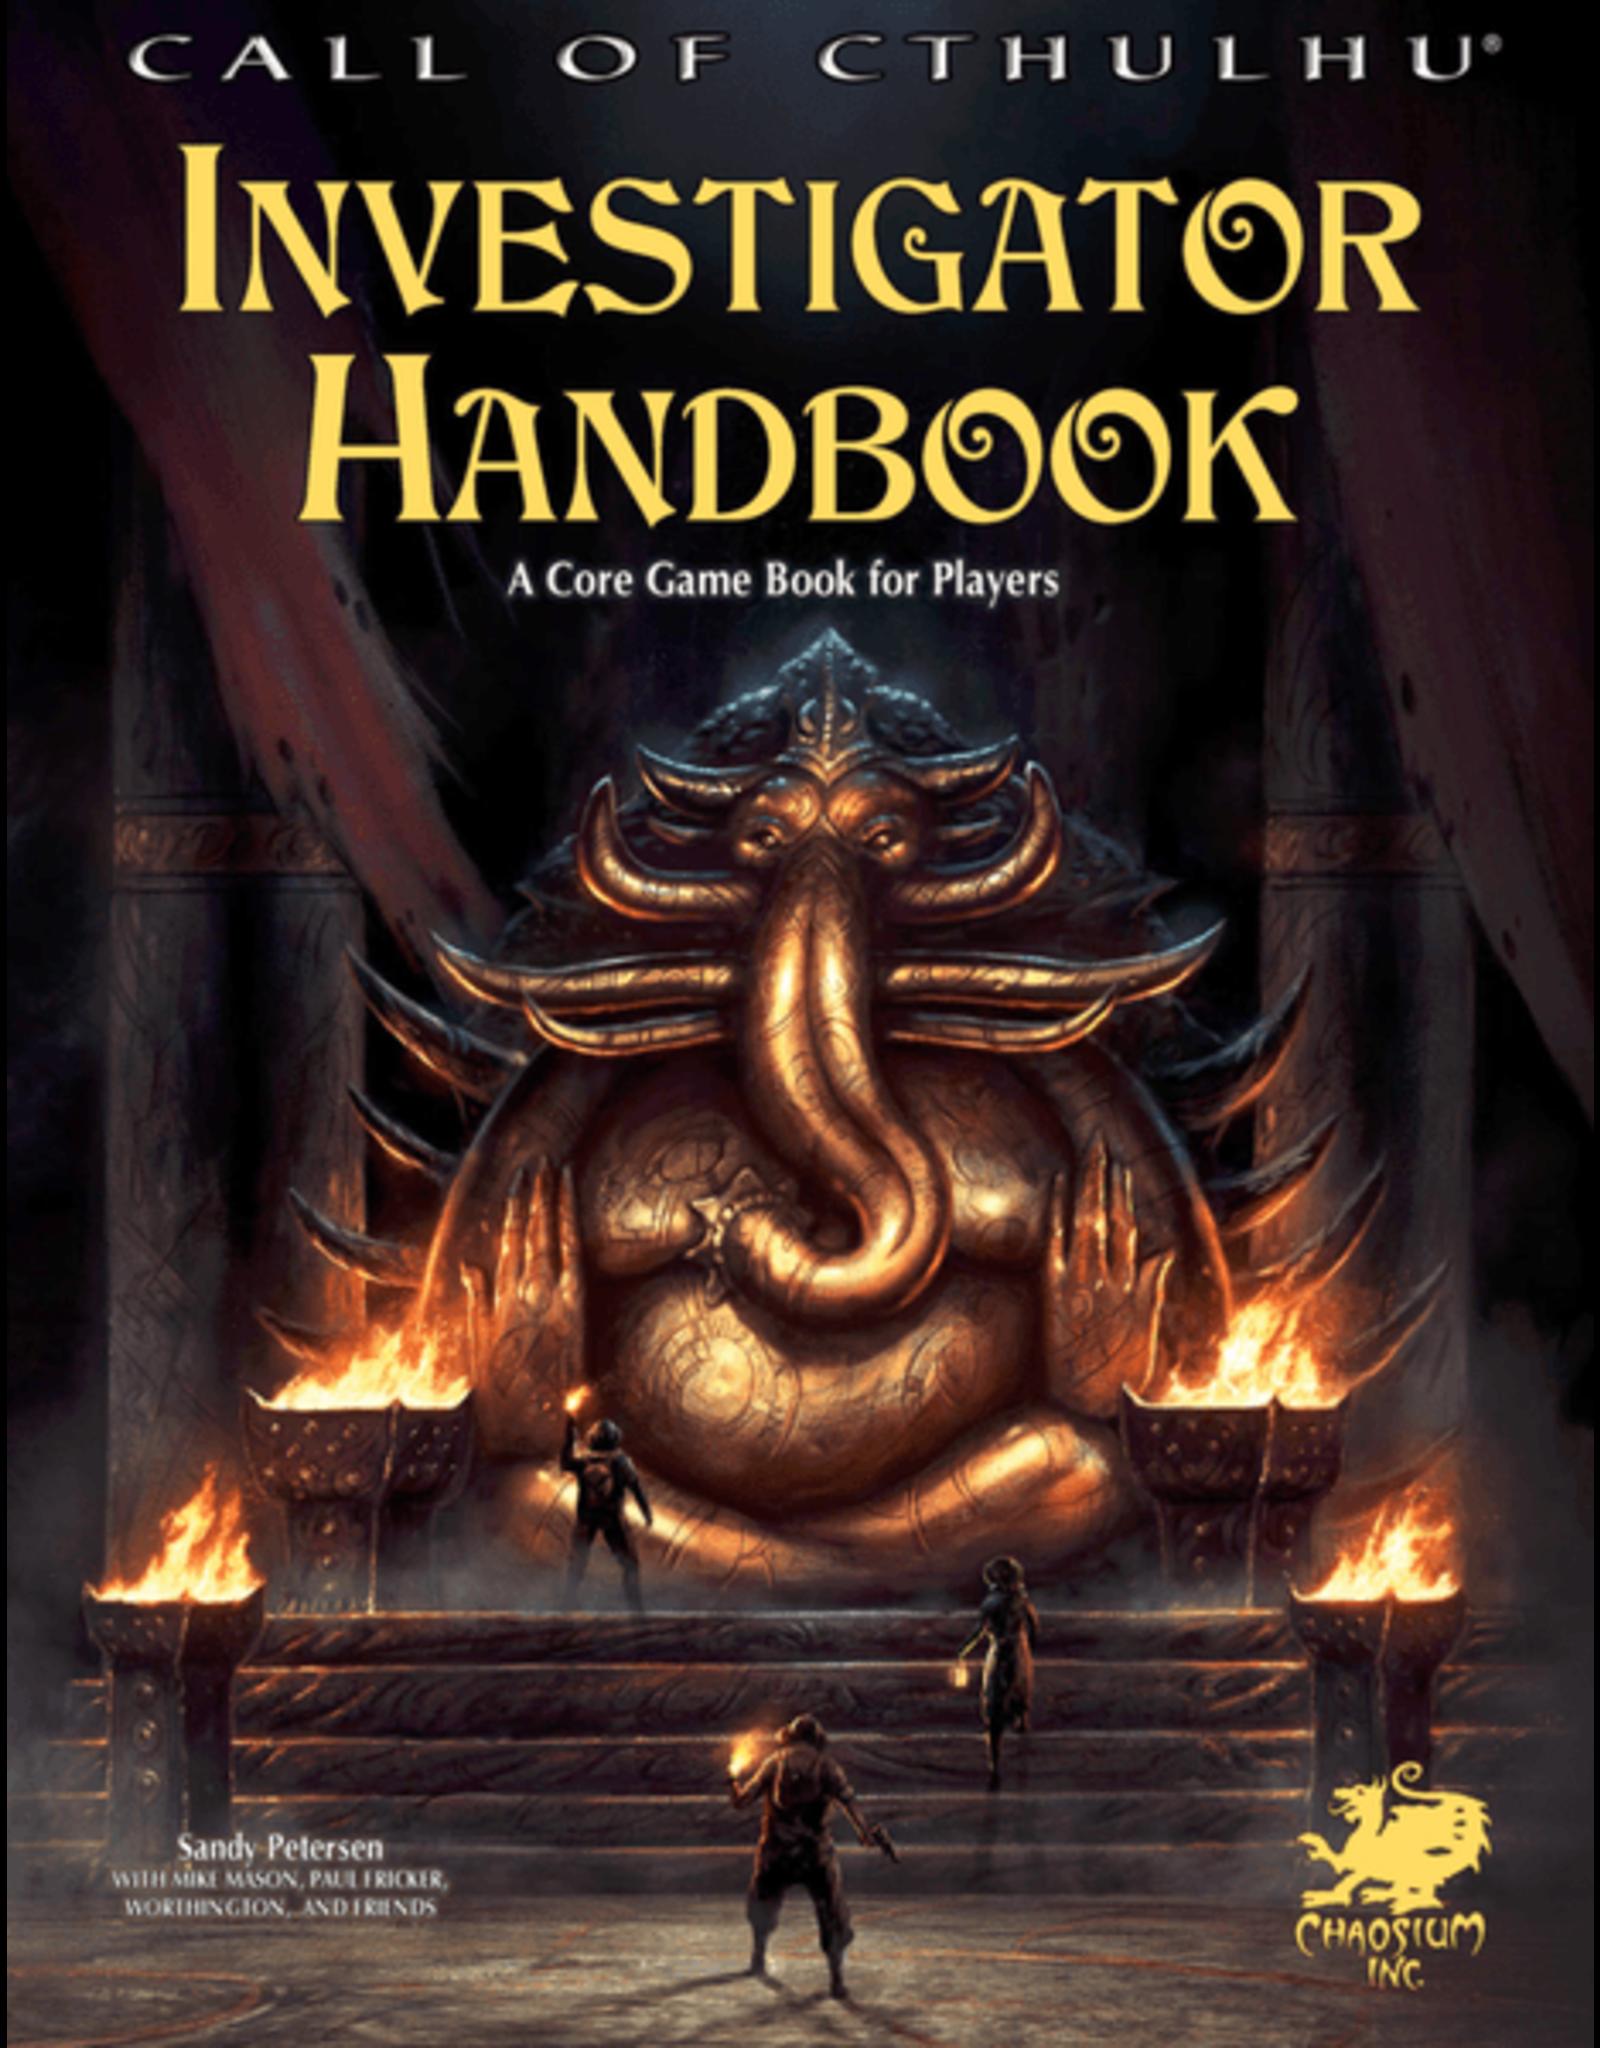 Chaosium Call of Cthulhu 7E: Investigator Handbook